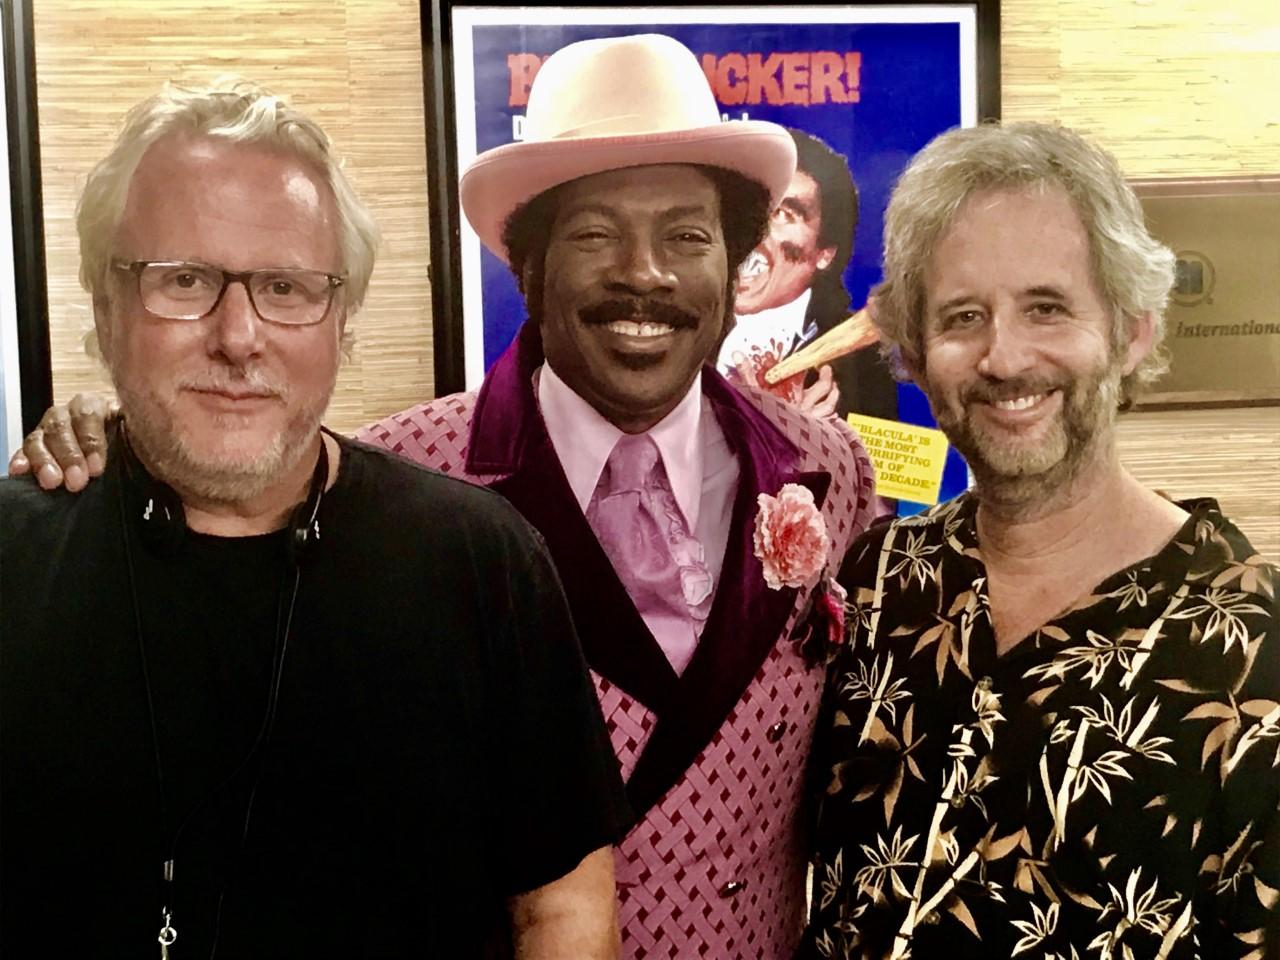 Larry Karaszewski, Eddie Murphy, and Scott Alexander on the set of Dolemite Is My Name.